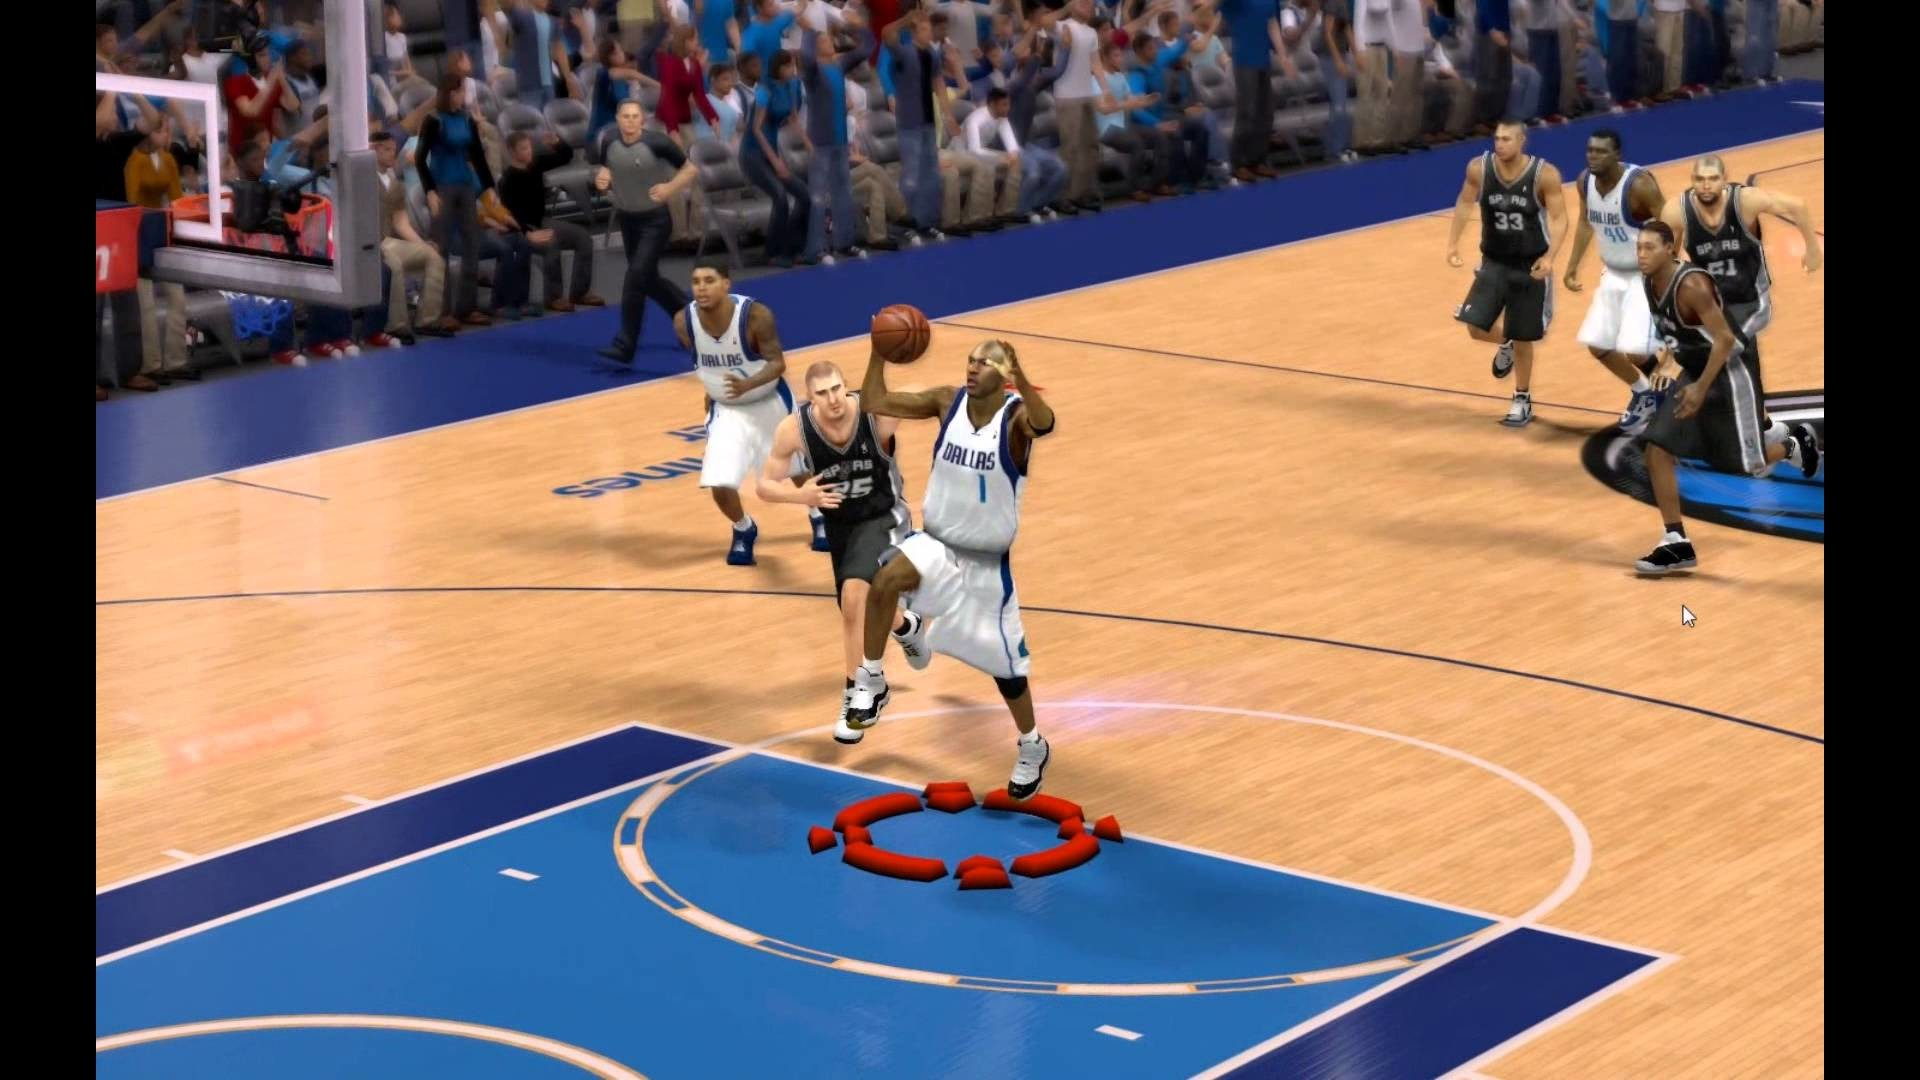 NBA 2K14 My Player – Michael Jordan Historic Free Throw Line Dunk – YouTube